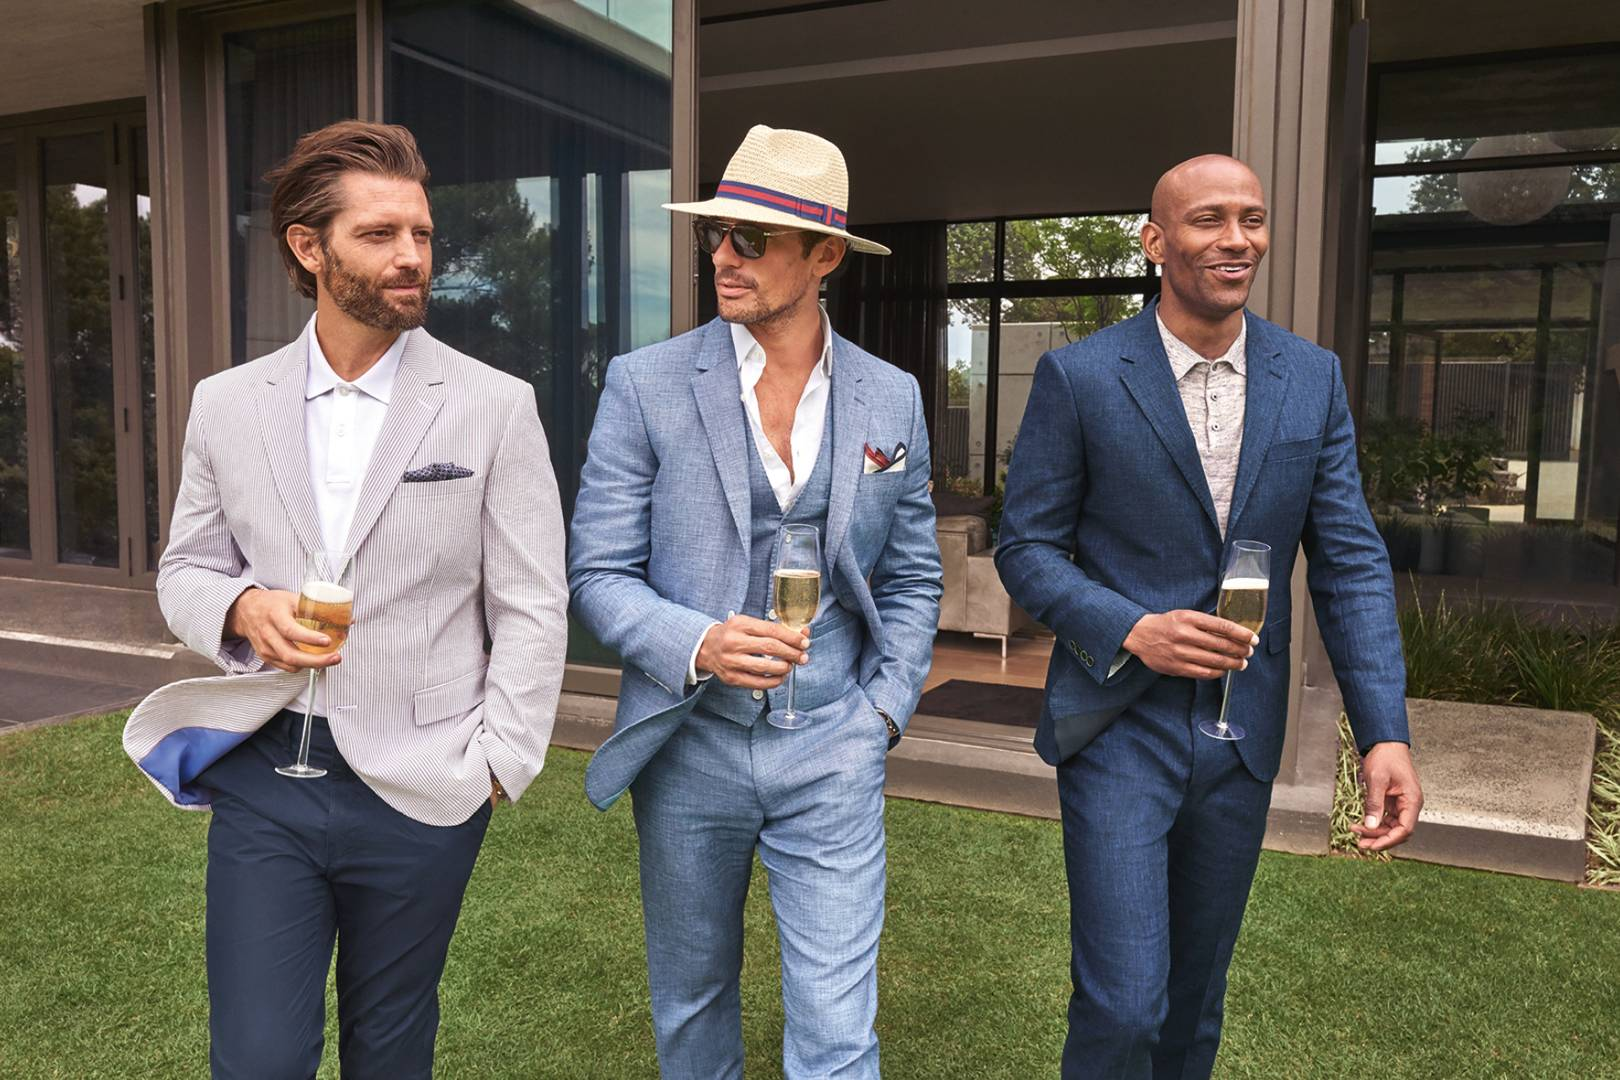 Luxusni Venkovska I Klasicka Jak Se Spravne Obleknout Na Svatbu